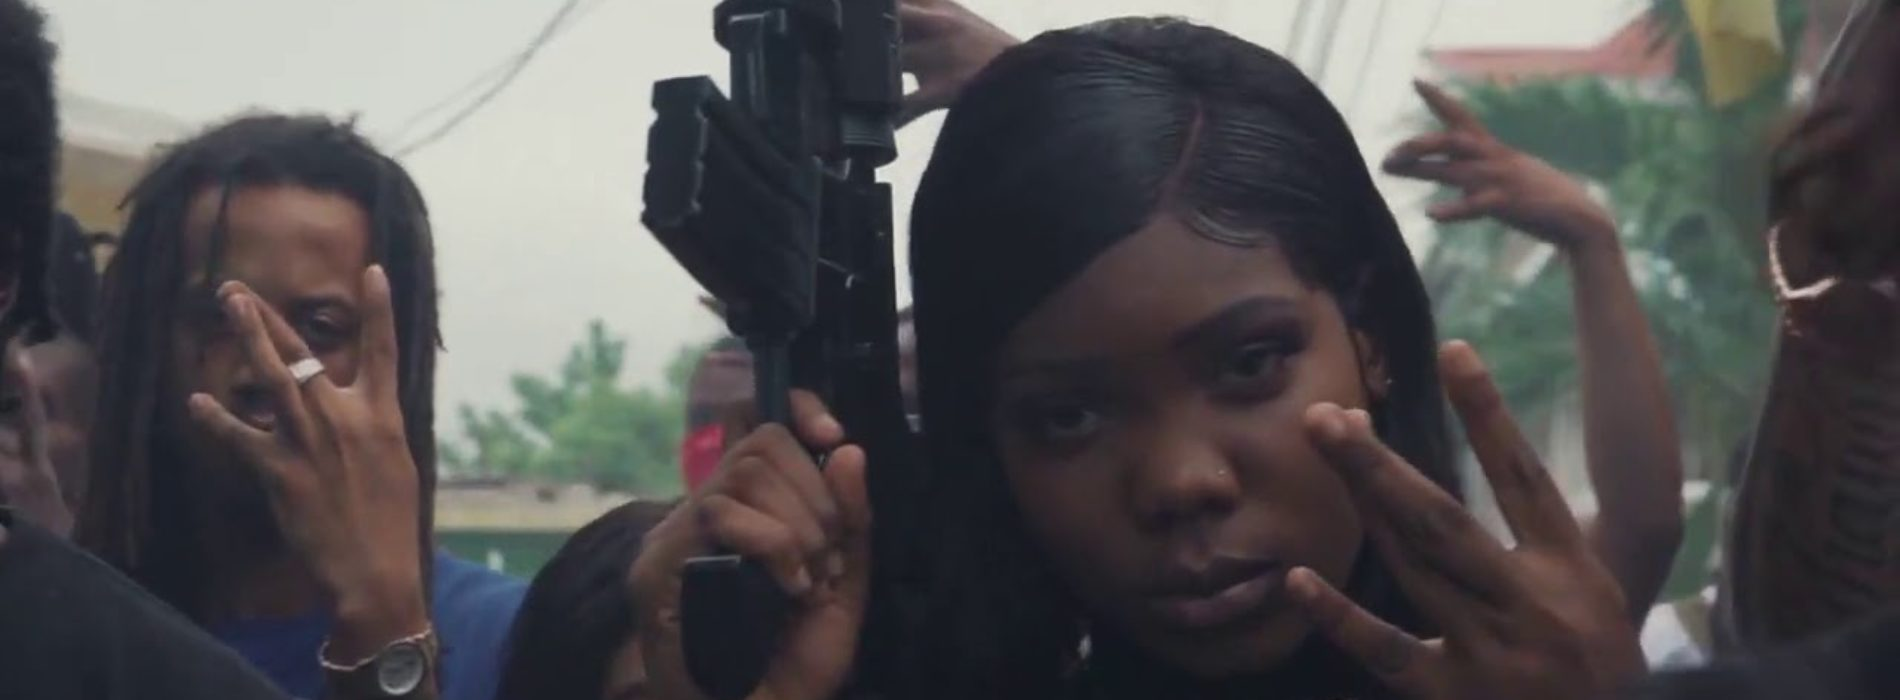 Vybz Kartel – Yami Bolo (Official Music Video) – Août 2020